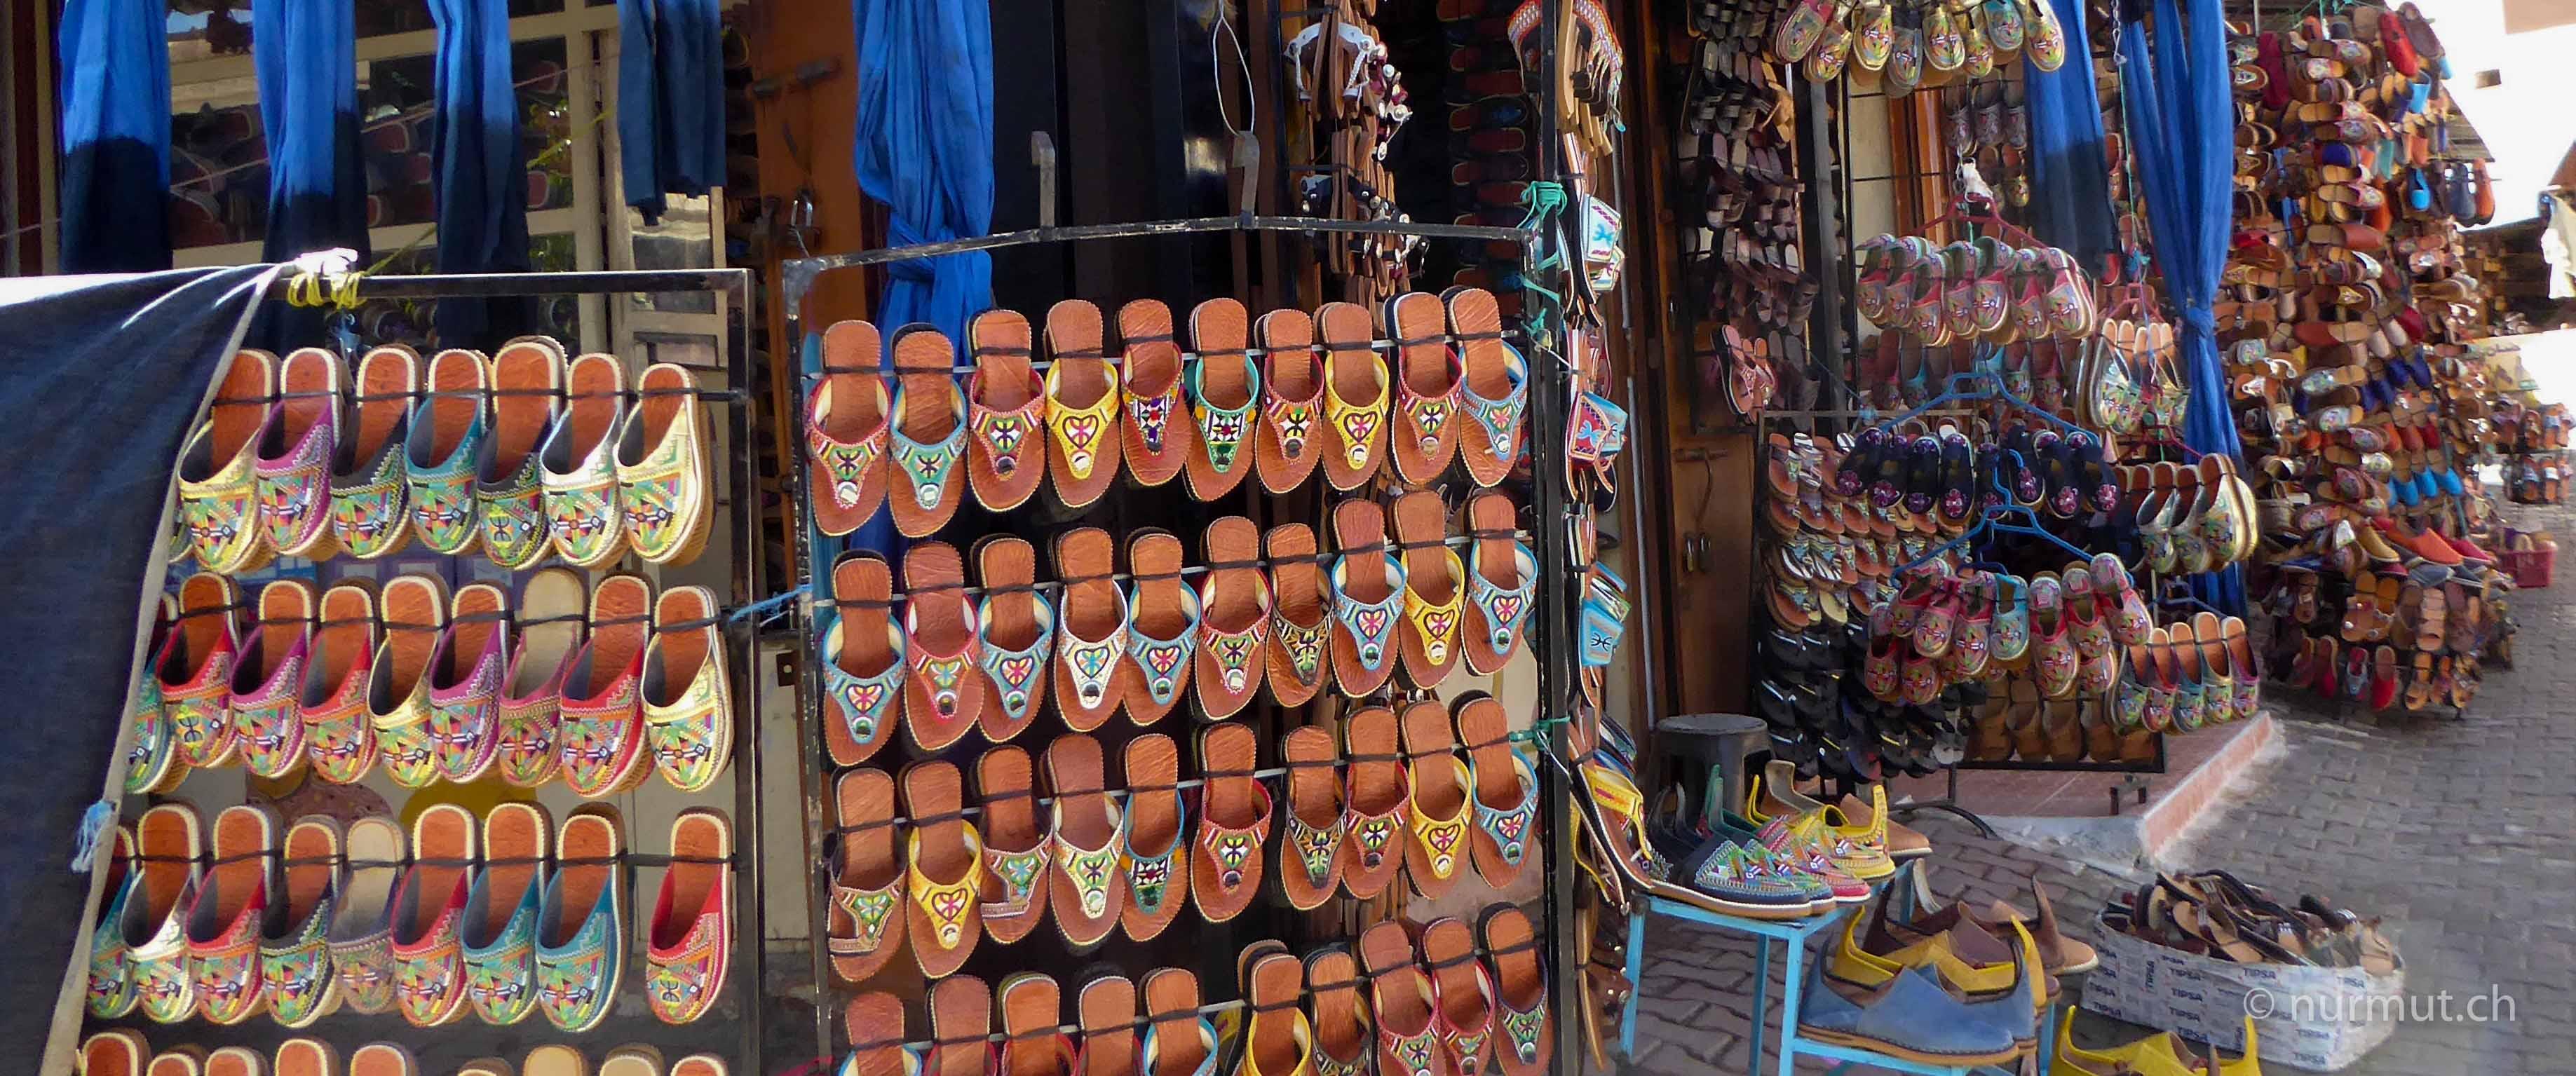 infos marokko mit hund-tafraoute-babouches-nurmut